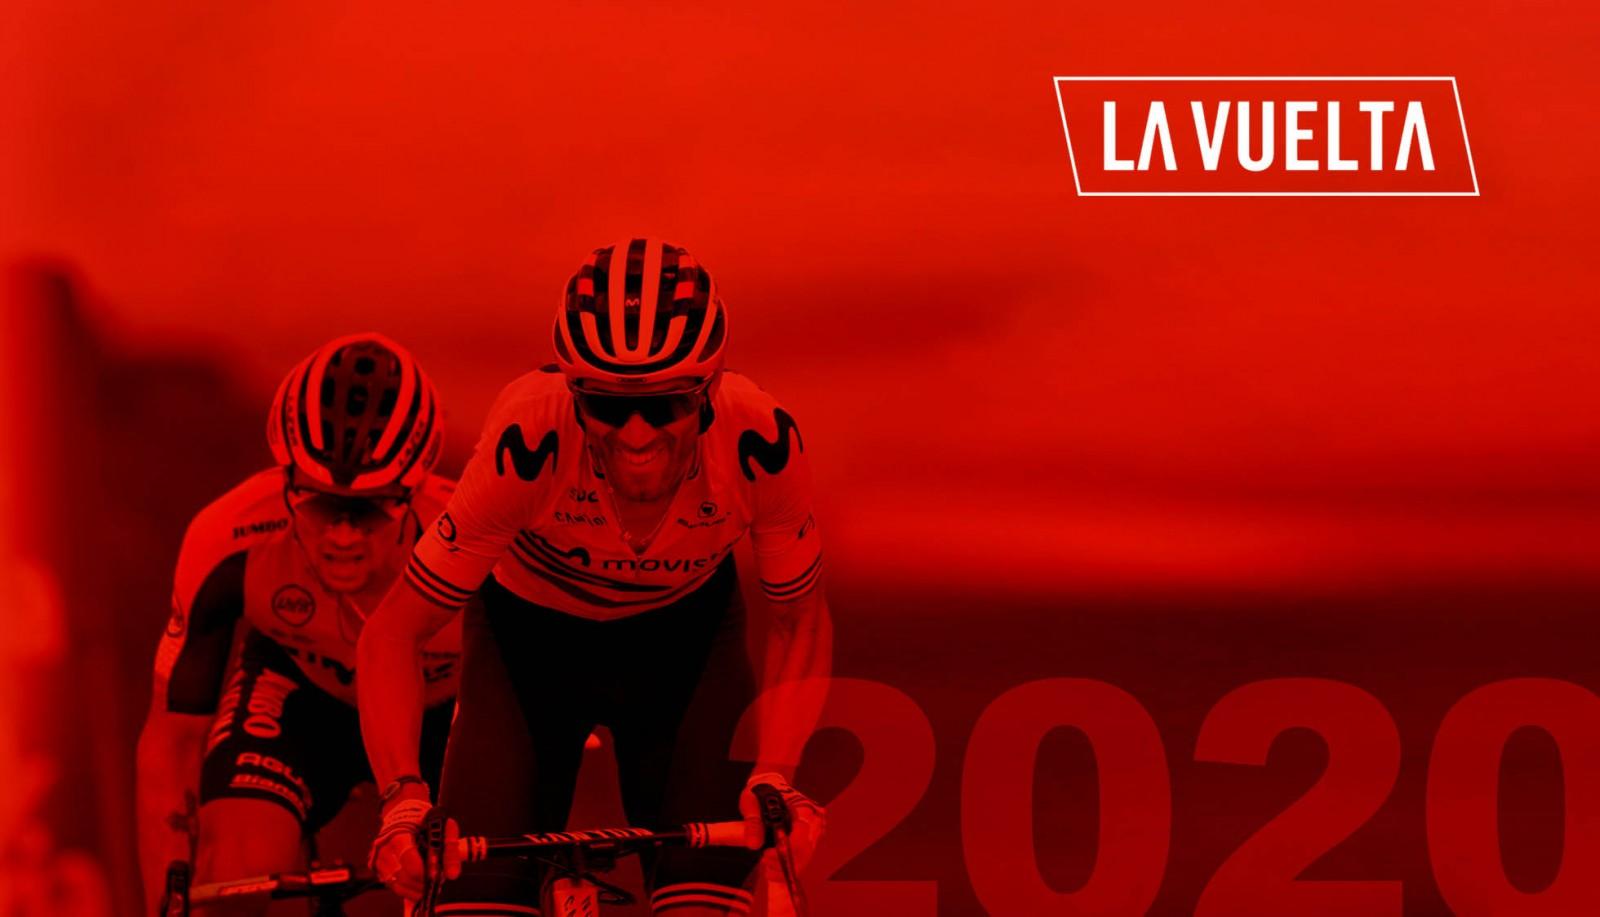 vuelta-espana-2020/